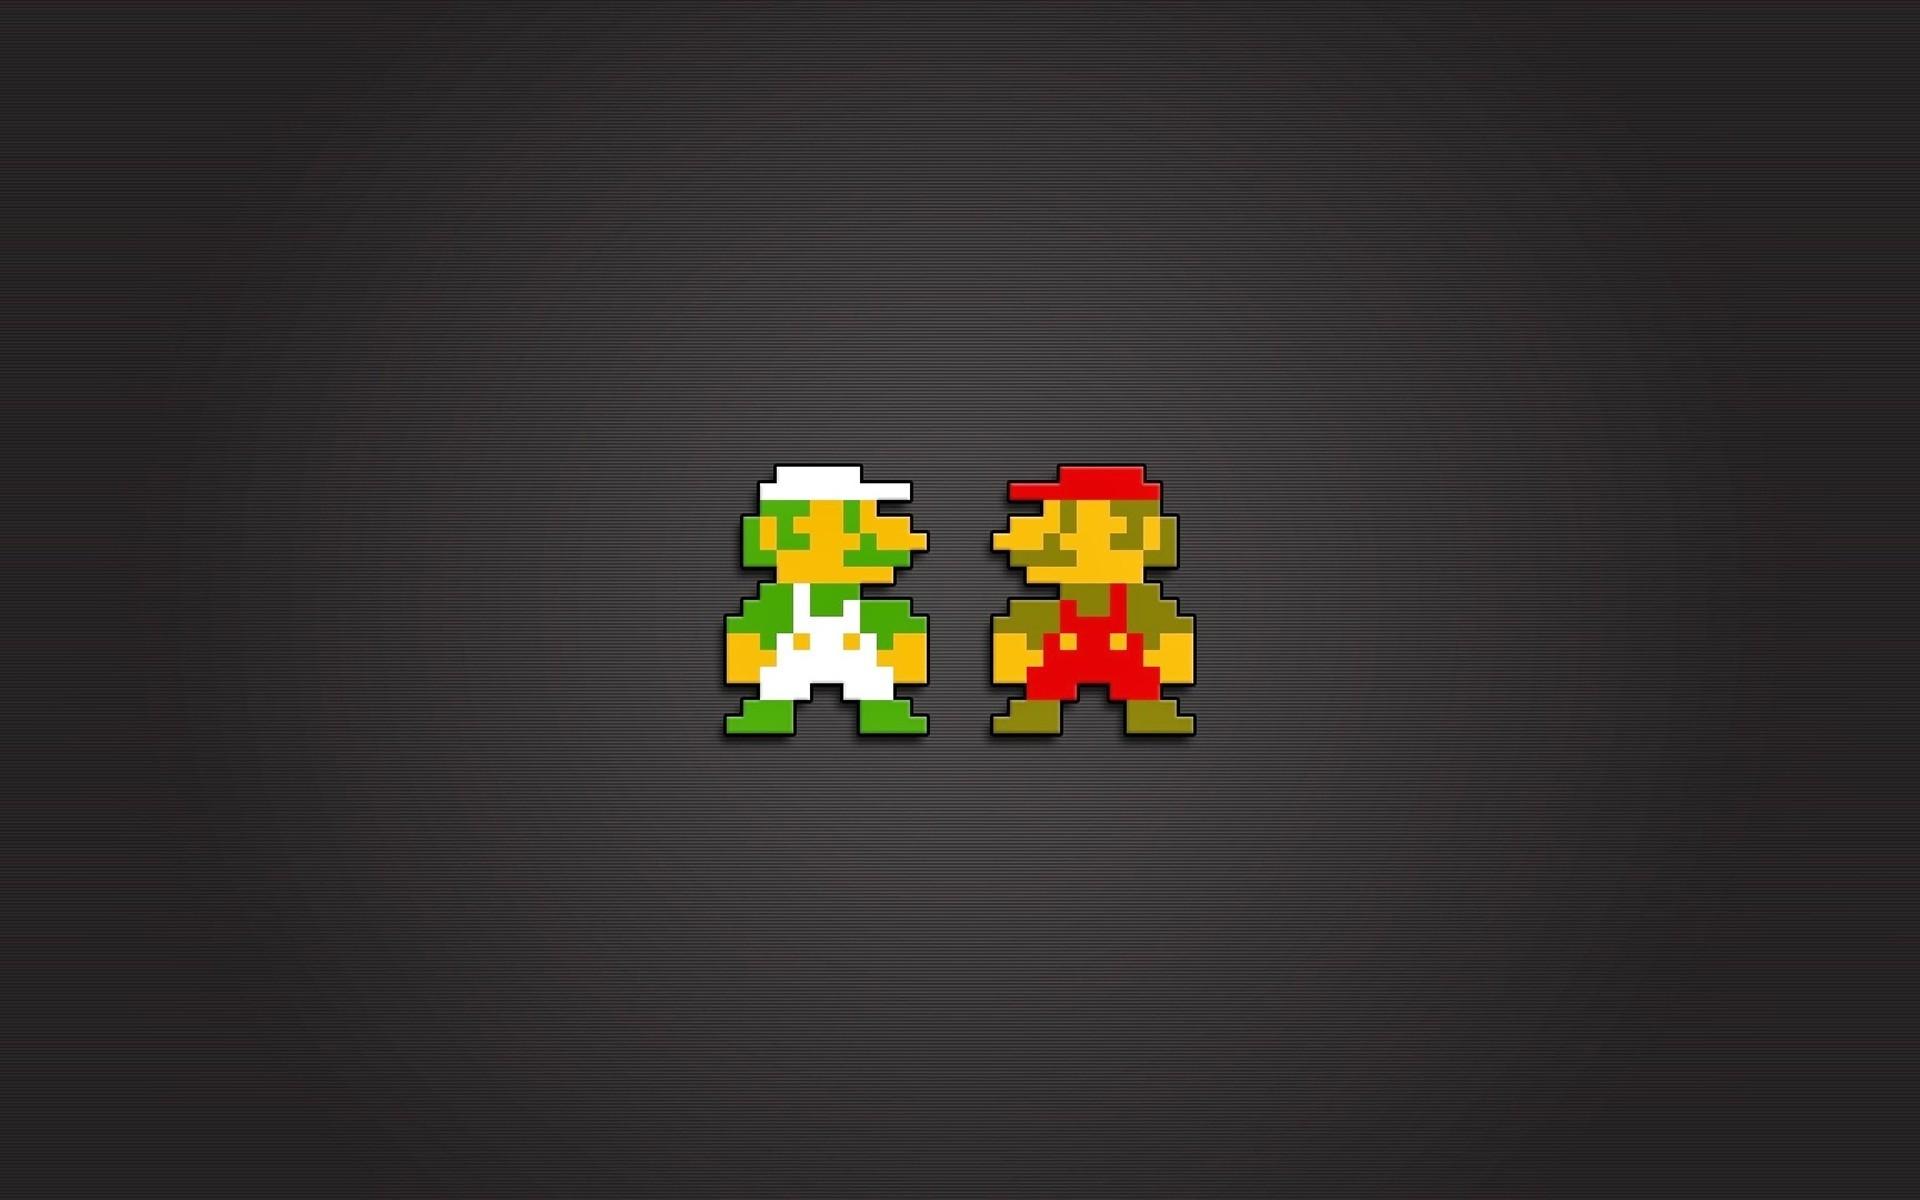 illustration video games text logo pixels 8 bit brand Mario Bros Nintendo Entertainment System Luigi number